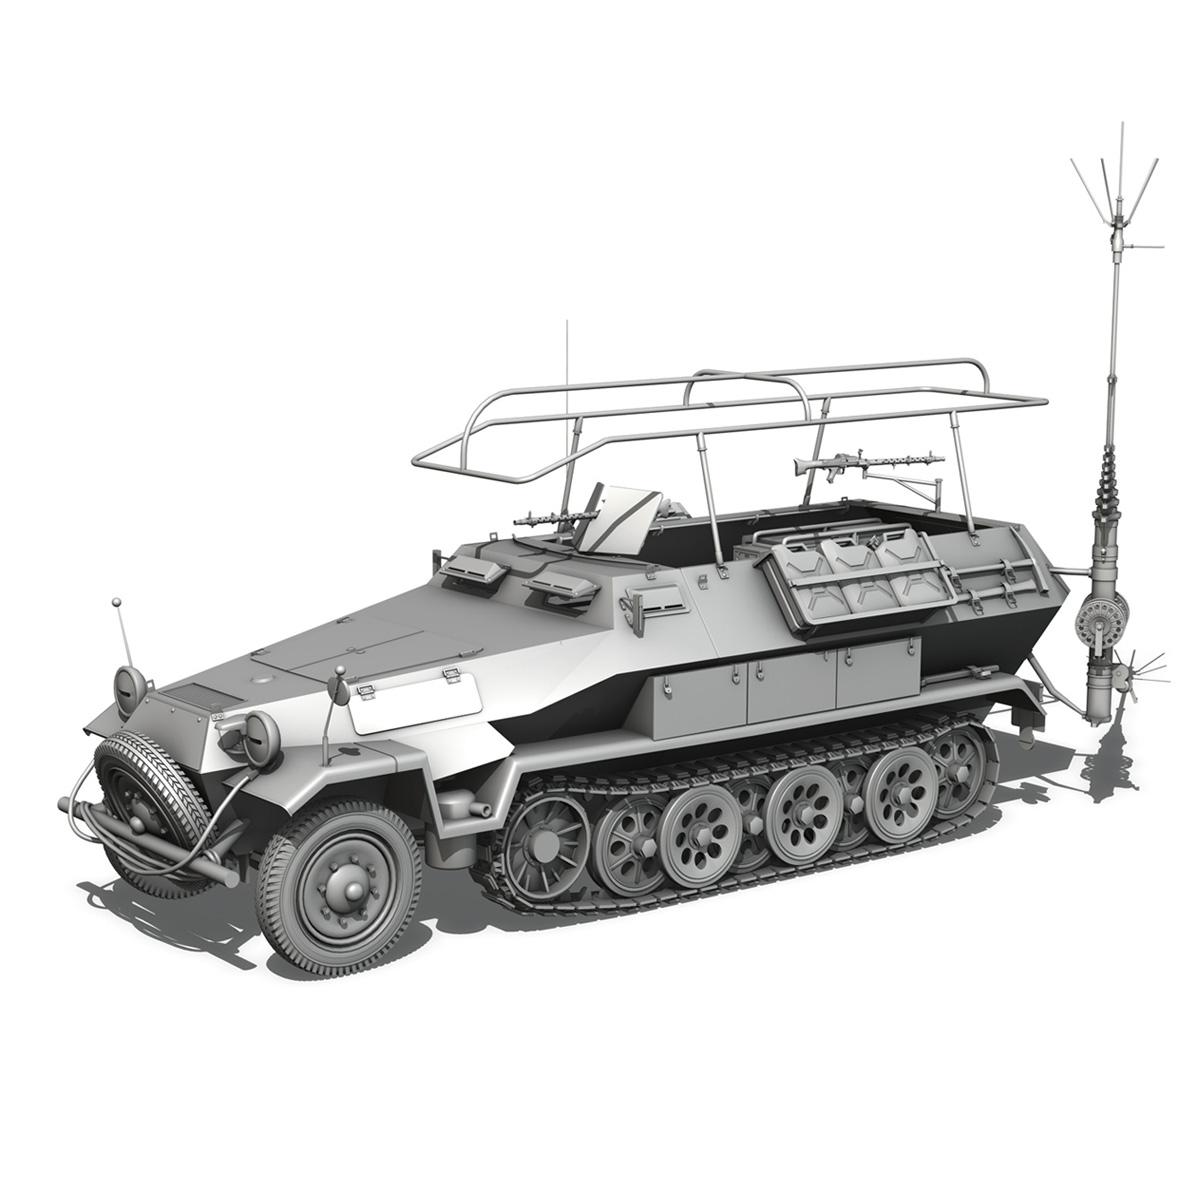 sdkfz 251 ausf.b – communications vehicle 3d model 3ds fbx c4d lwo obj 251693